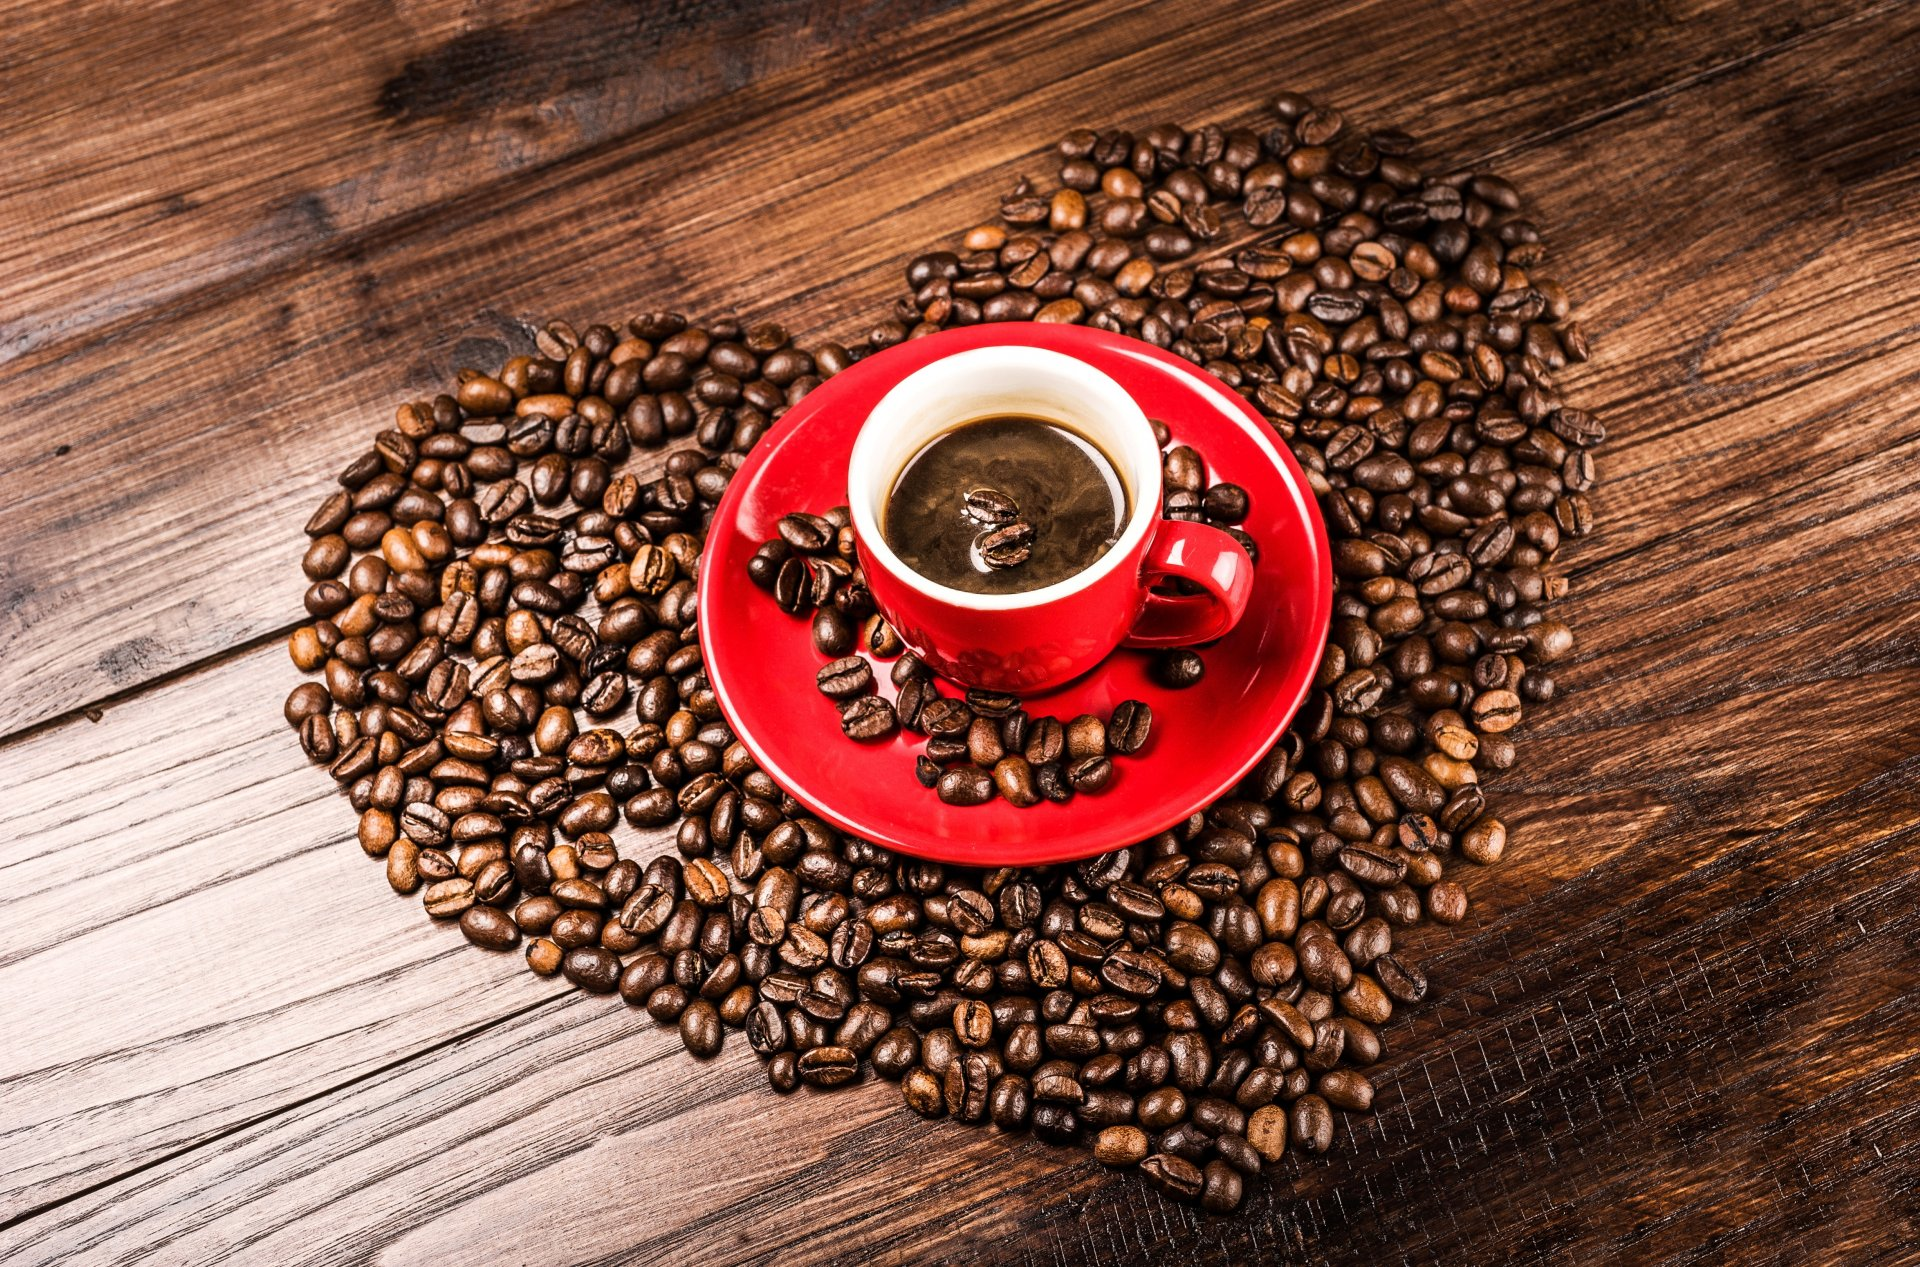 стилевое картинки про кофе на столе представляют